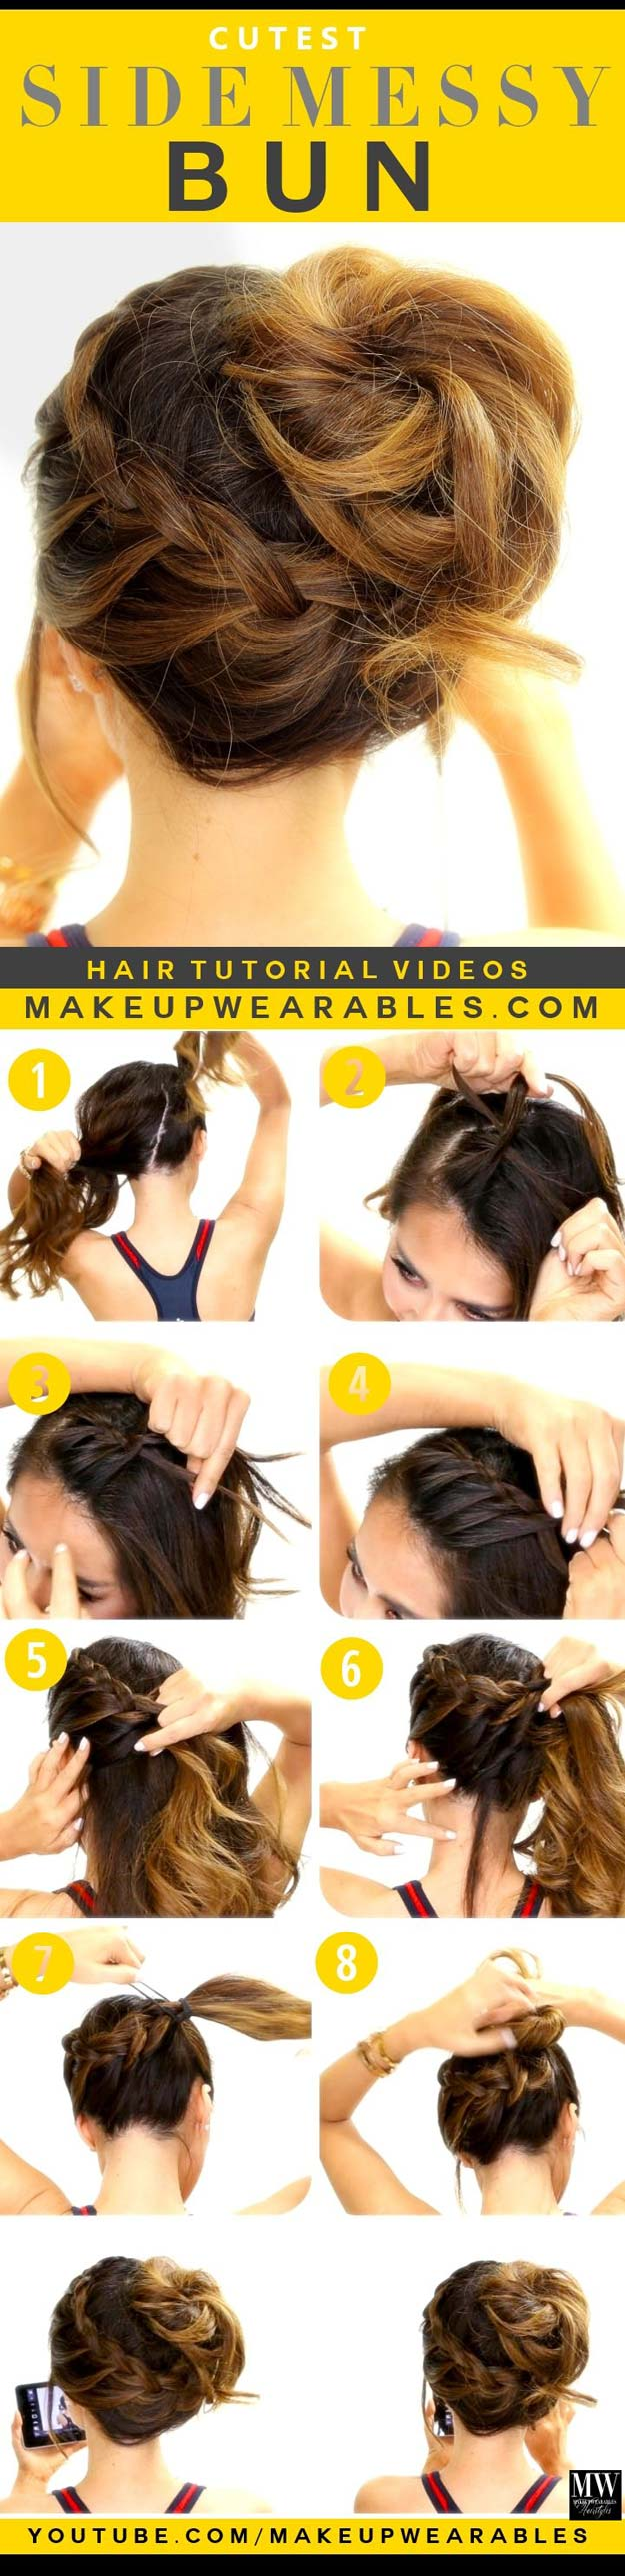 60 Easy Step By Step Hair Tutorials For Long Medium And Short Hair